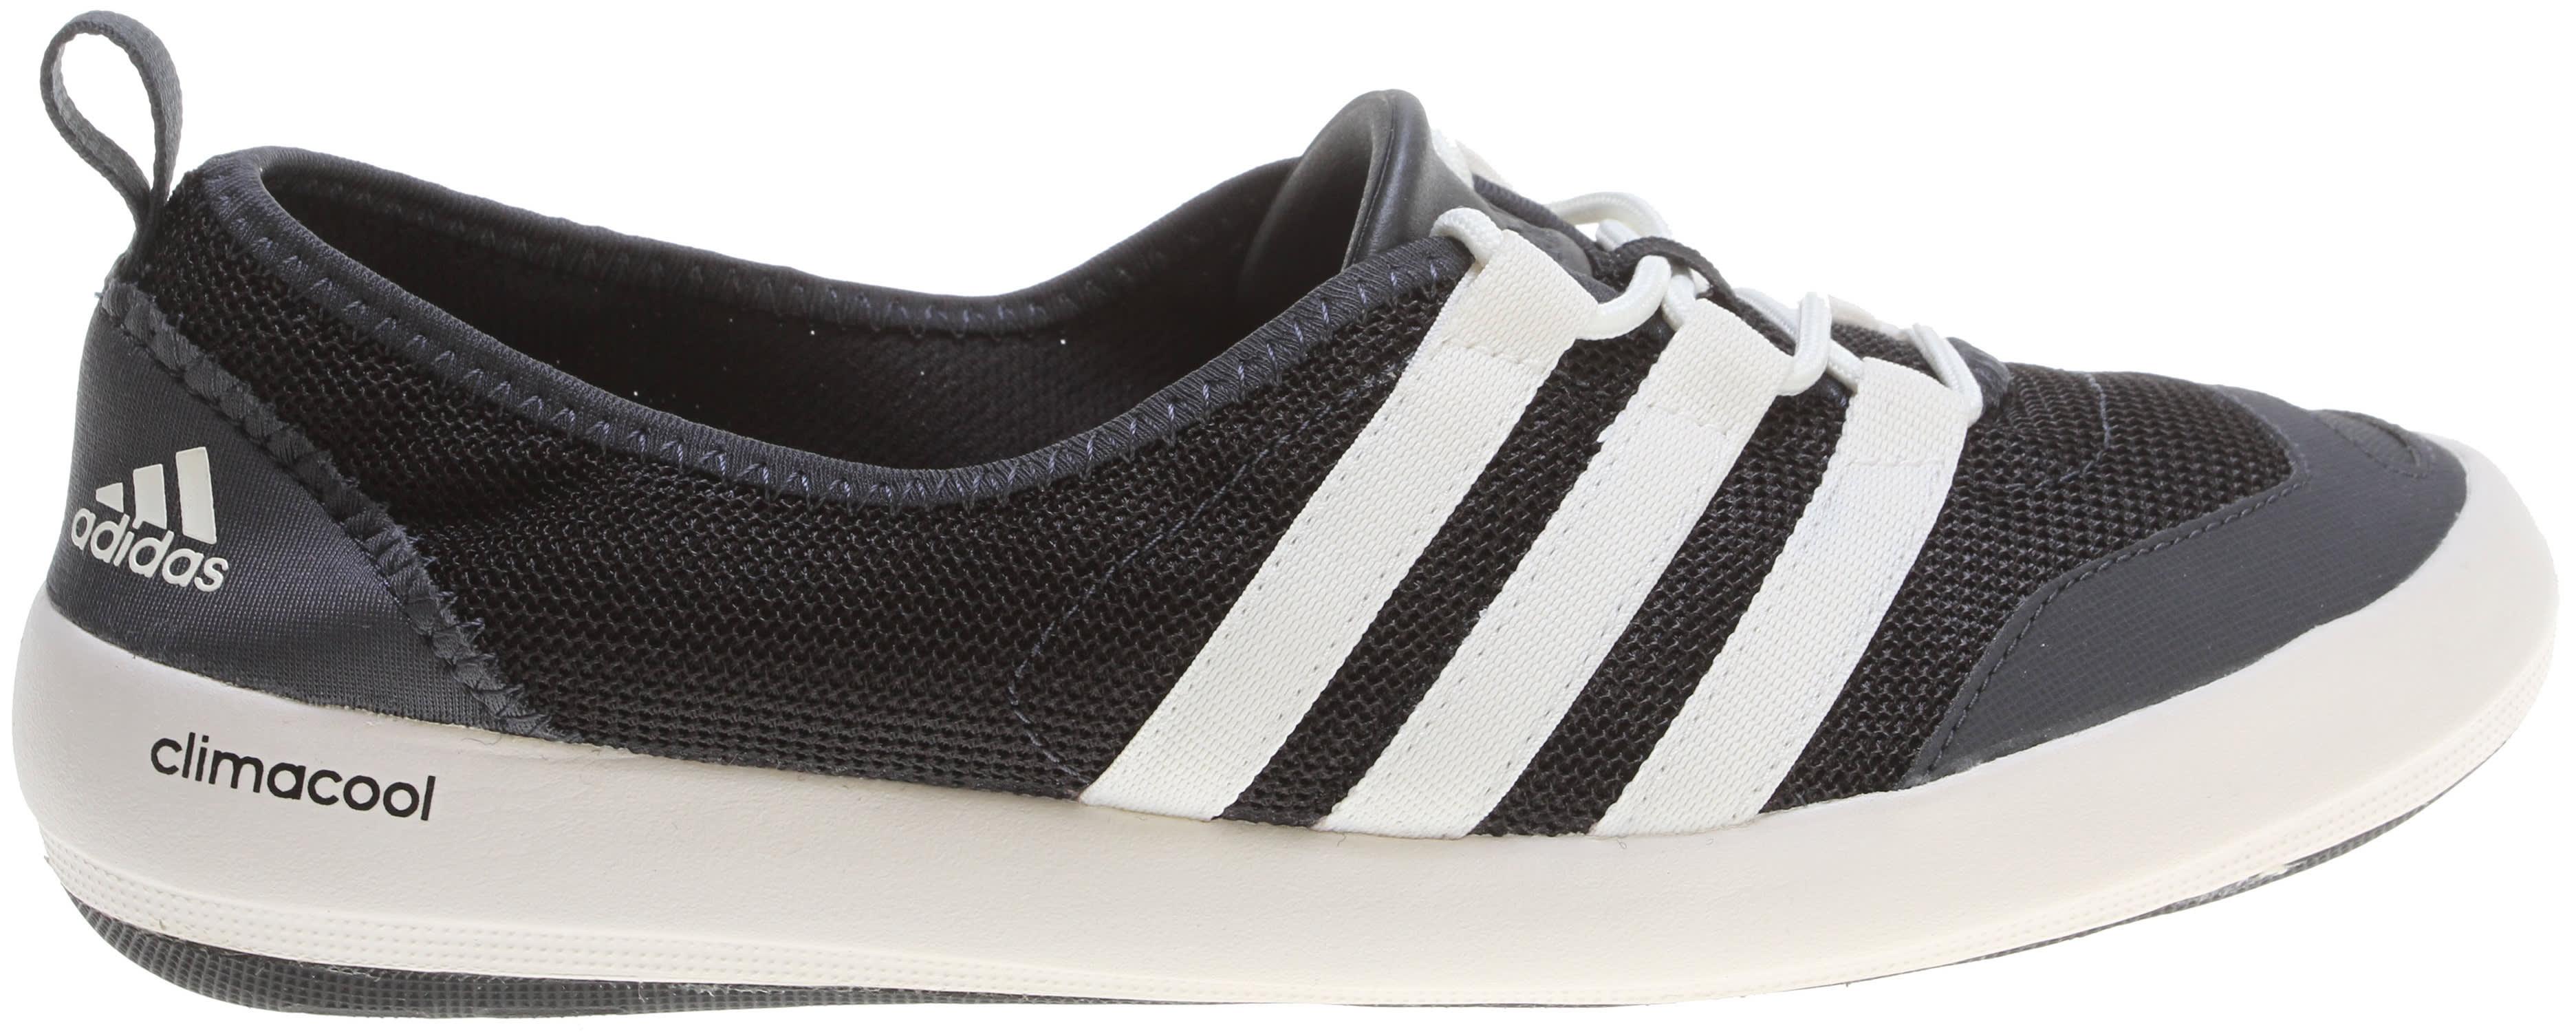 on sale 230e3 a01bc Adidas Climacool Boat Sleek Water Shoes - thumbnail 1